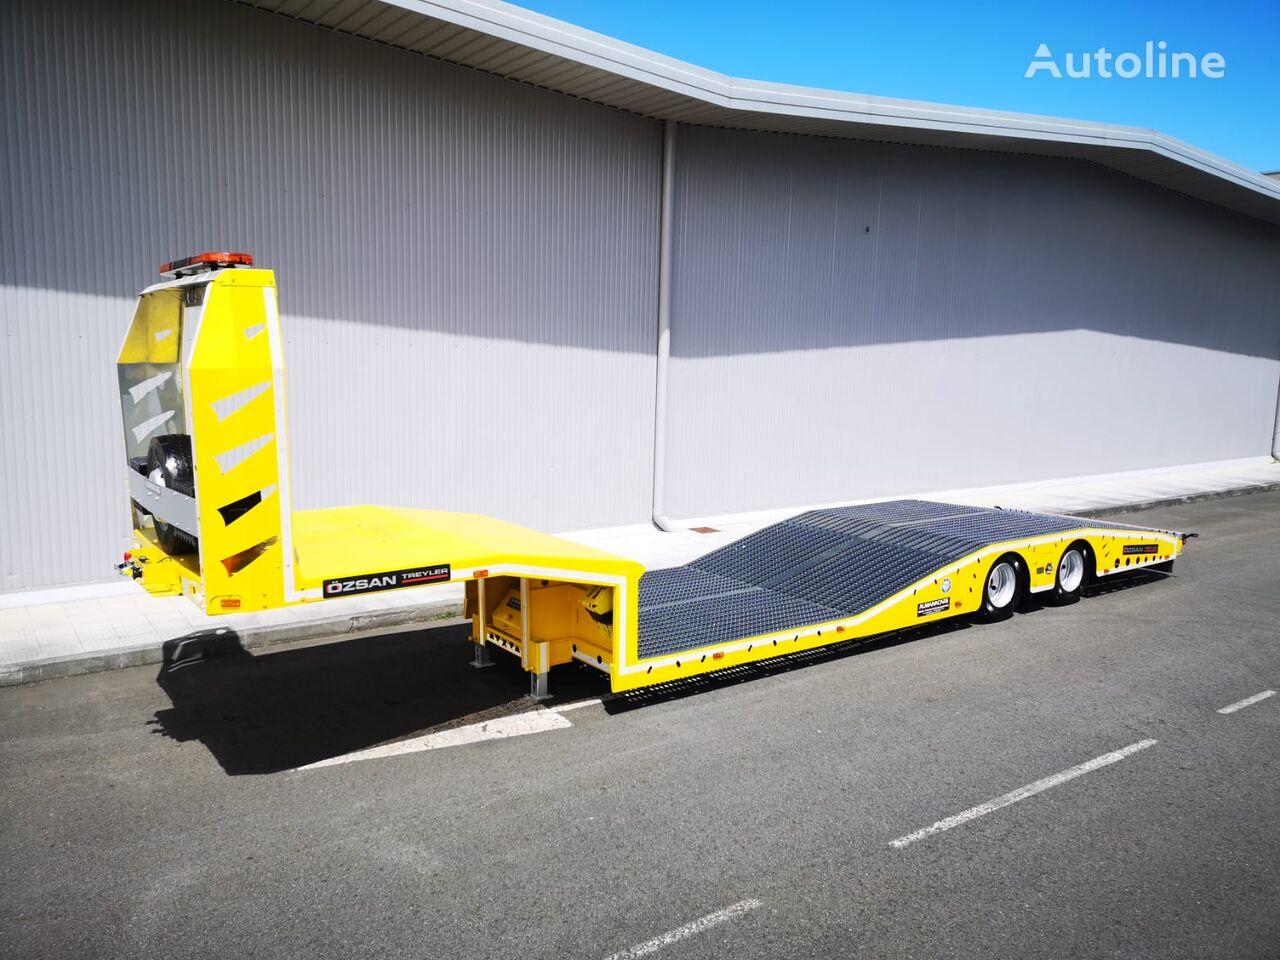 new Ozsan Trailer ARLA car transporter semi-trailer